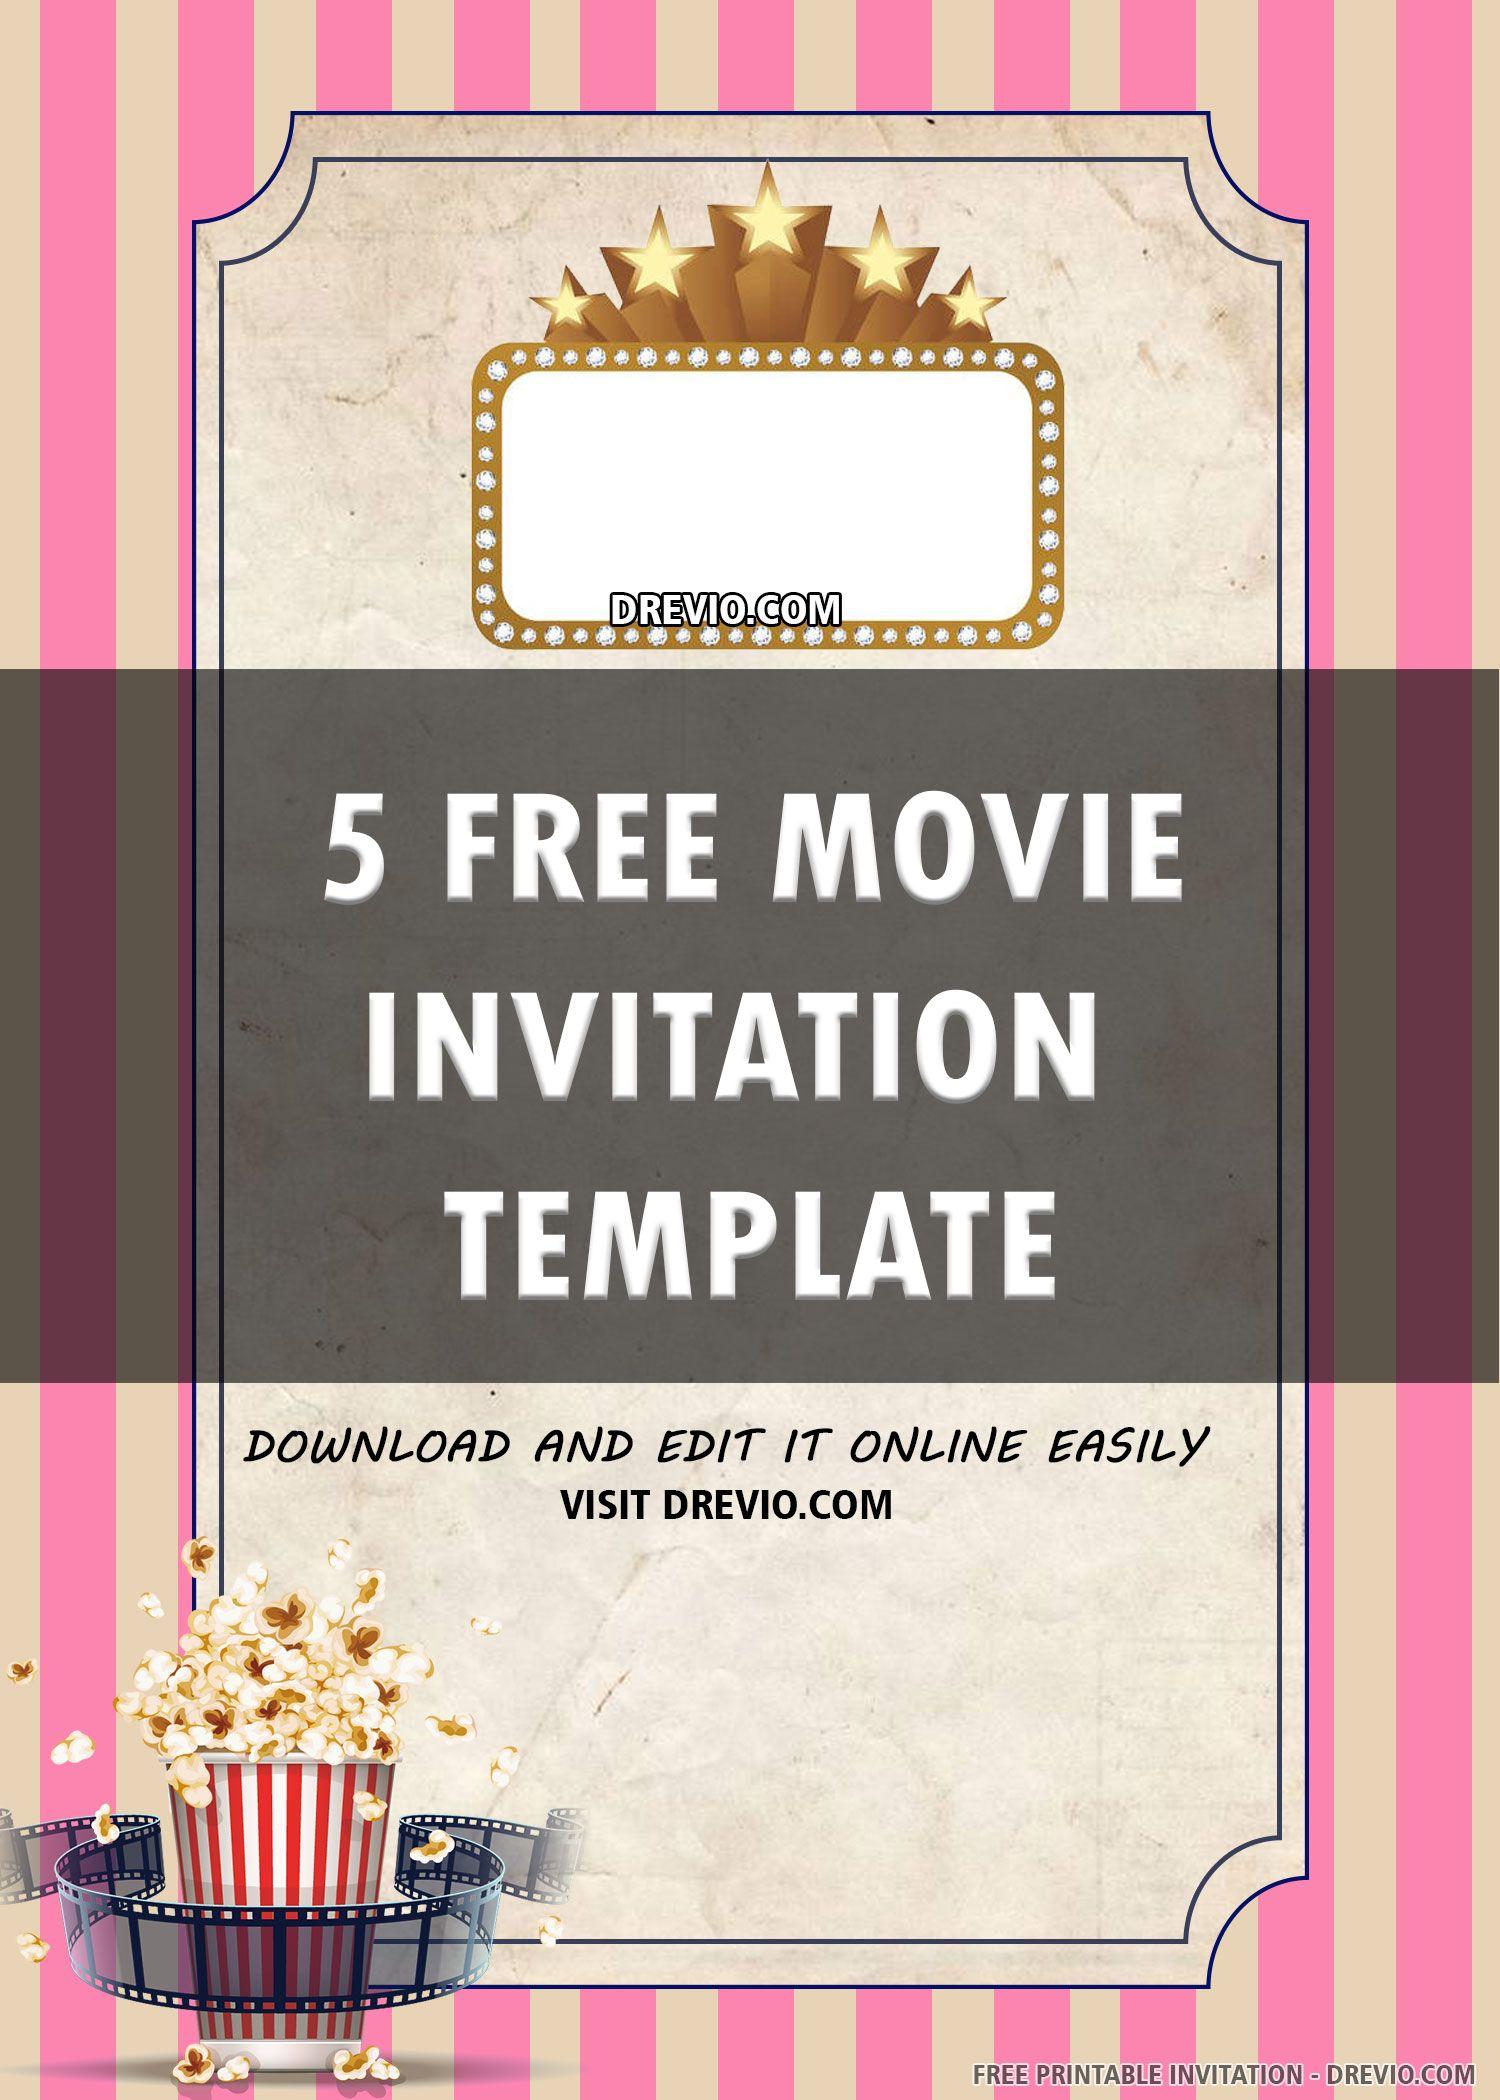 Free Printable Movie Night Invitation Template Movie Night Invitations Movie Ticket Invitations Free Printable Birthday Invitations